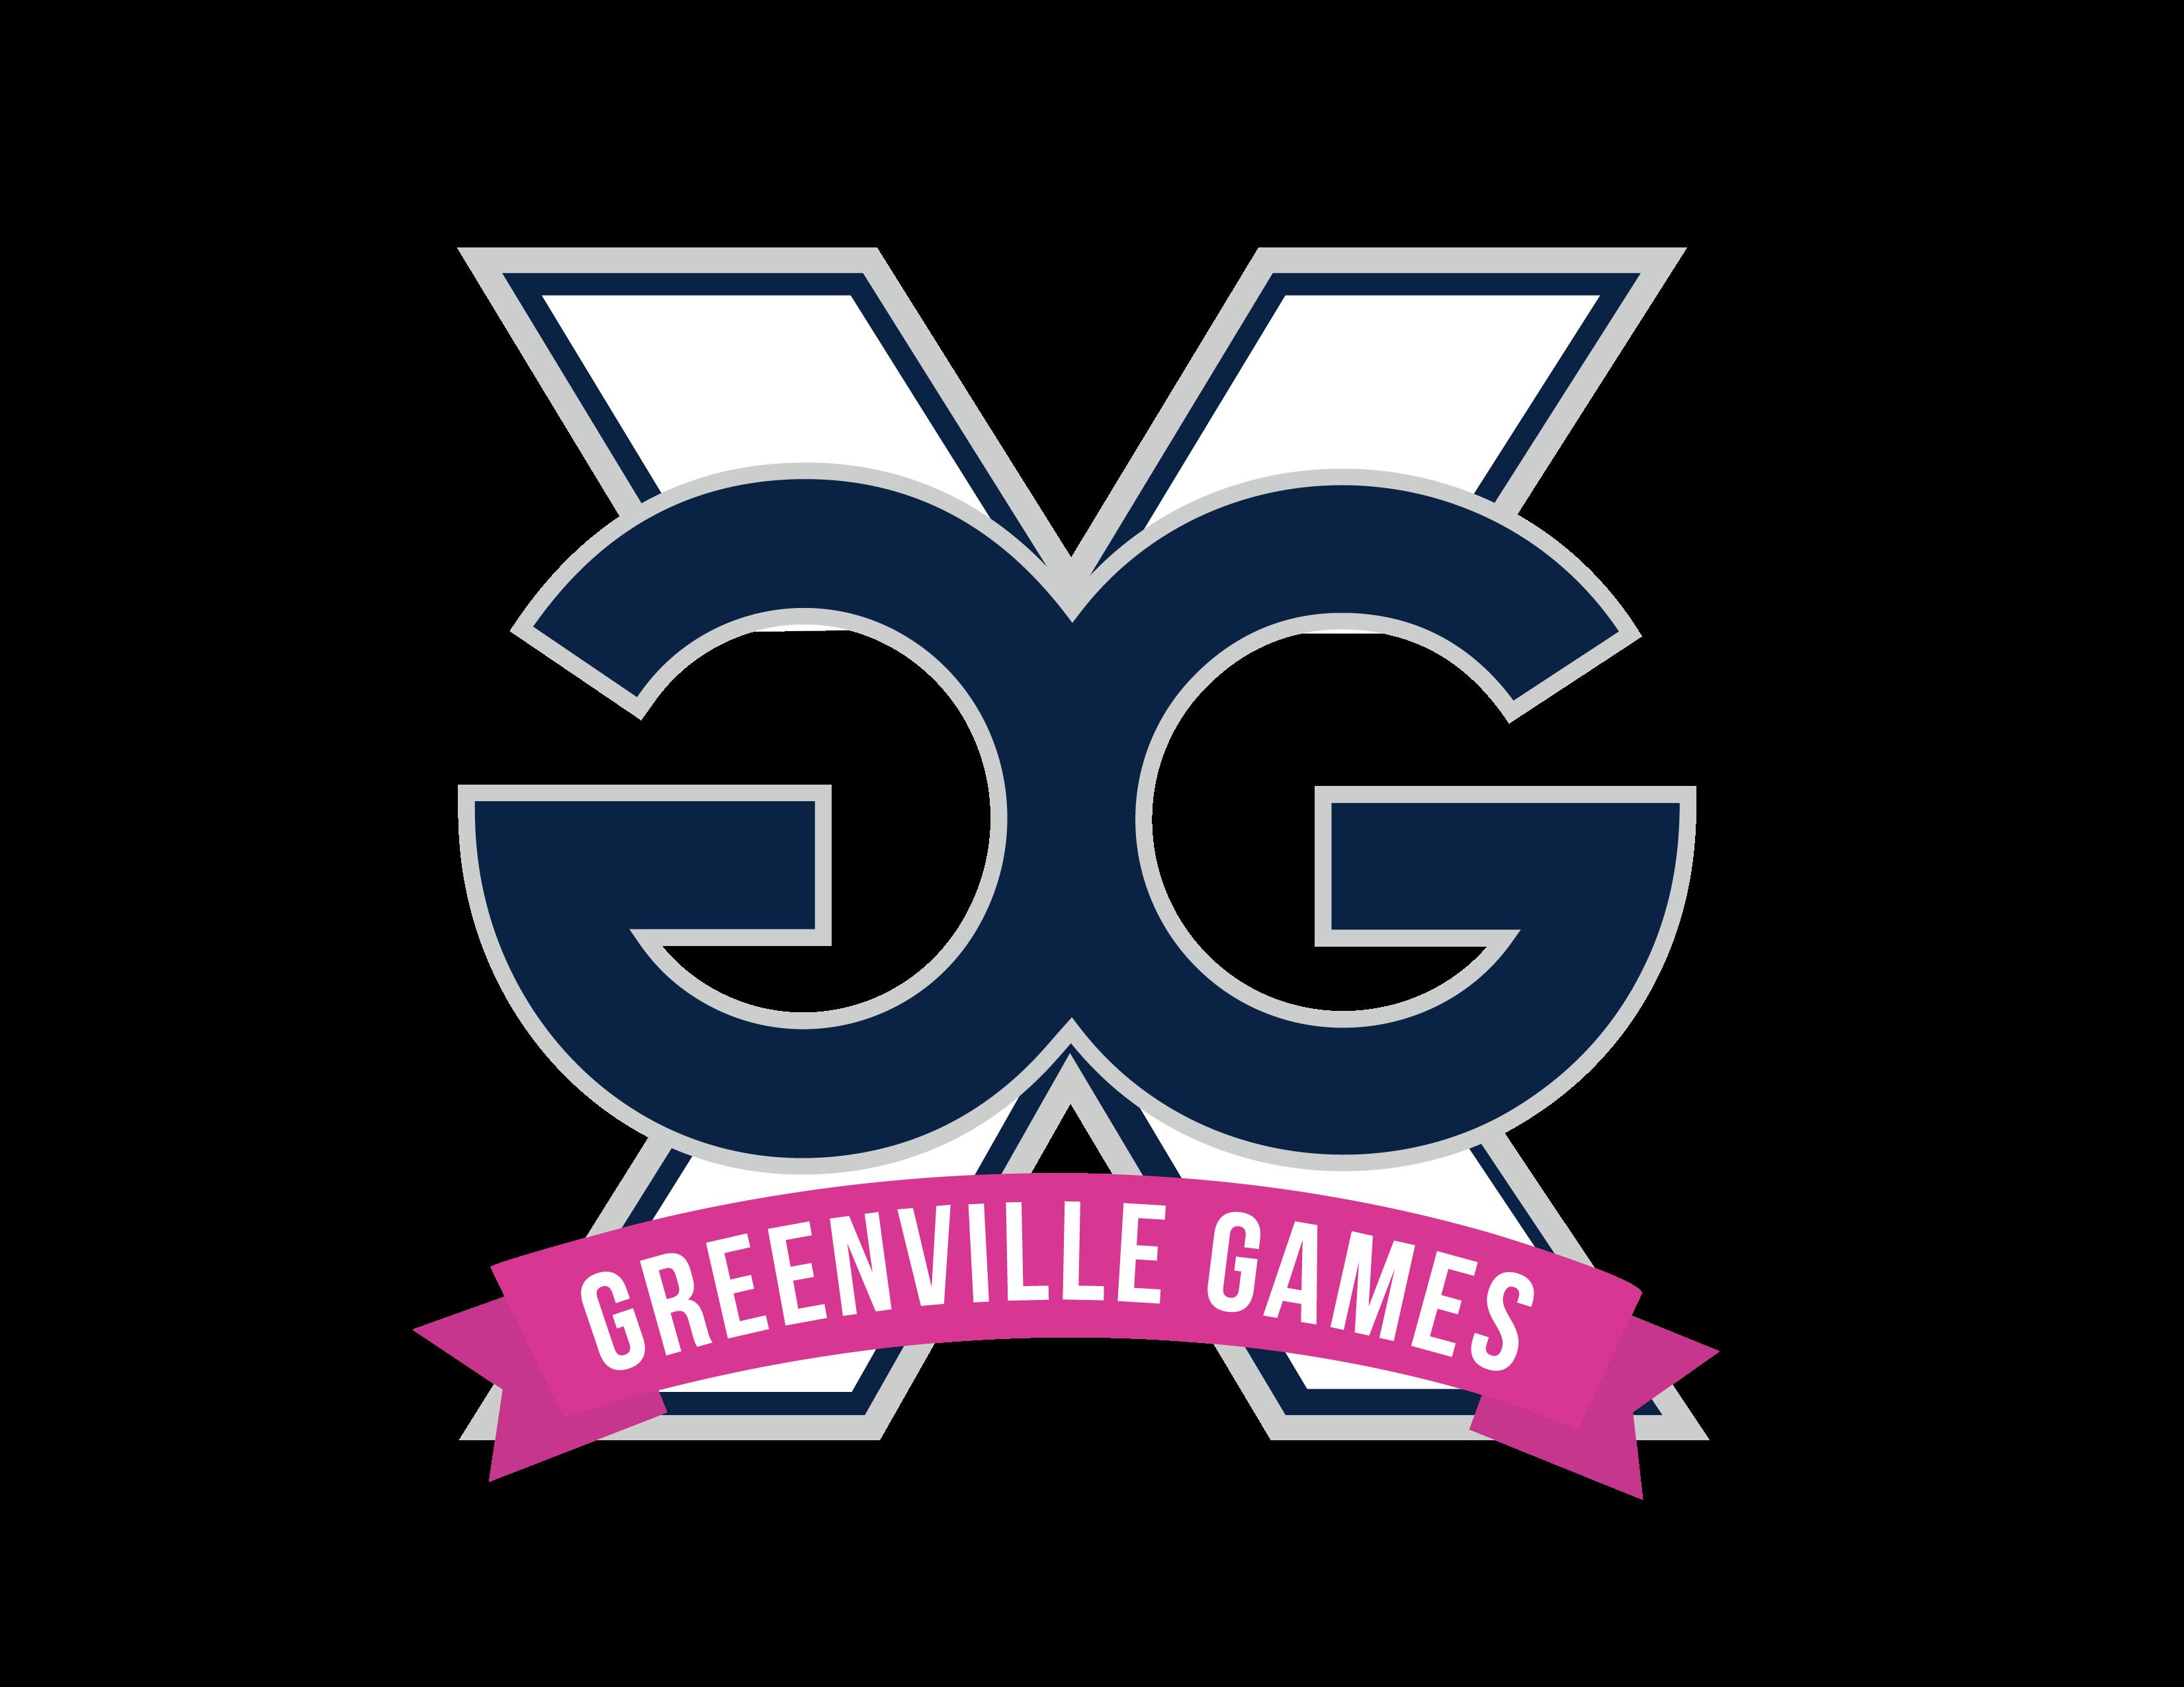 2019 Greenville Games Registration